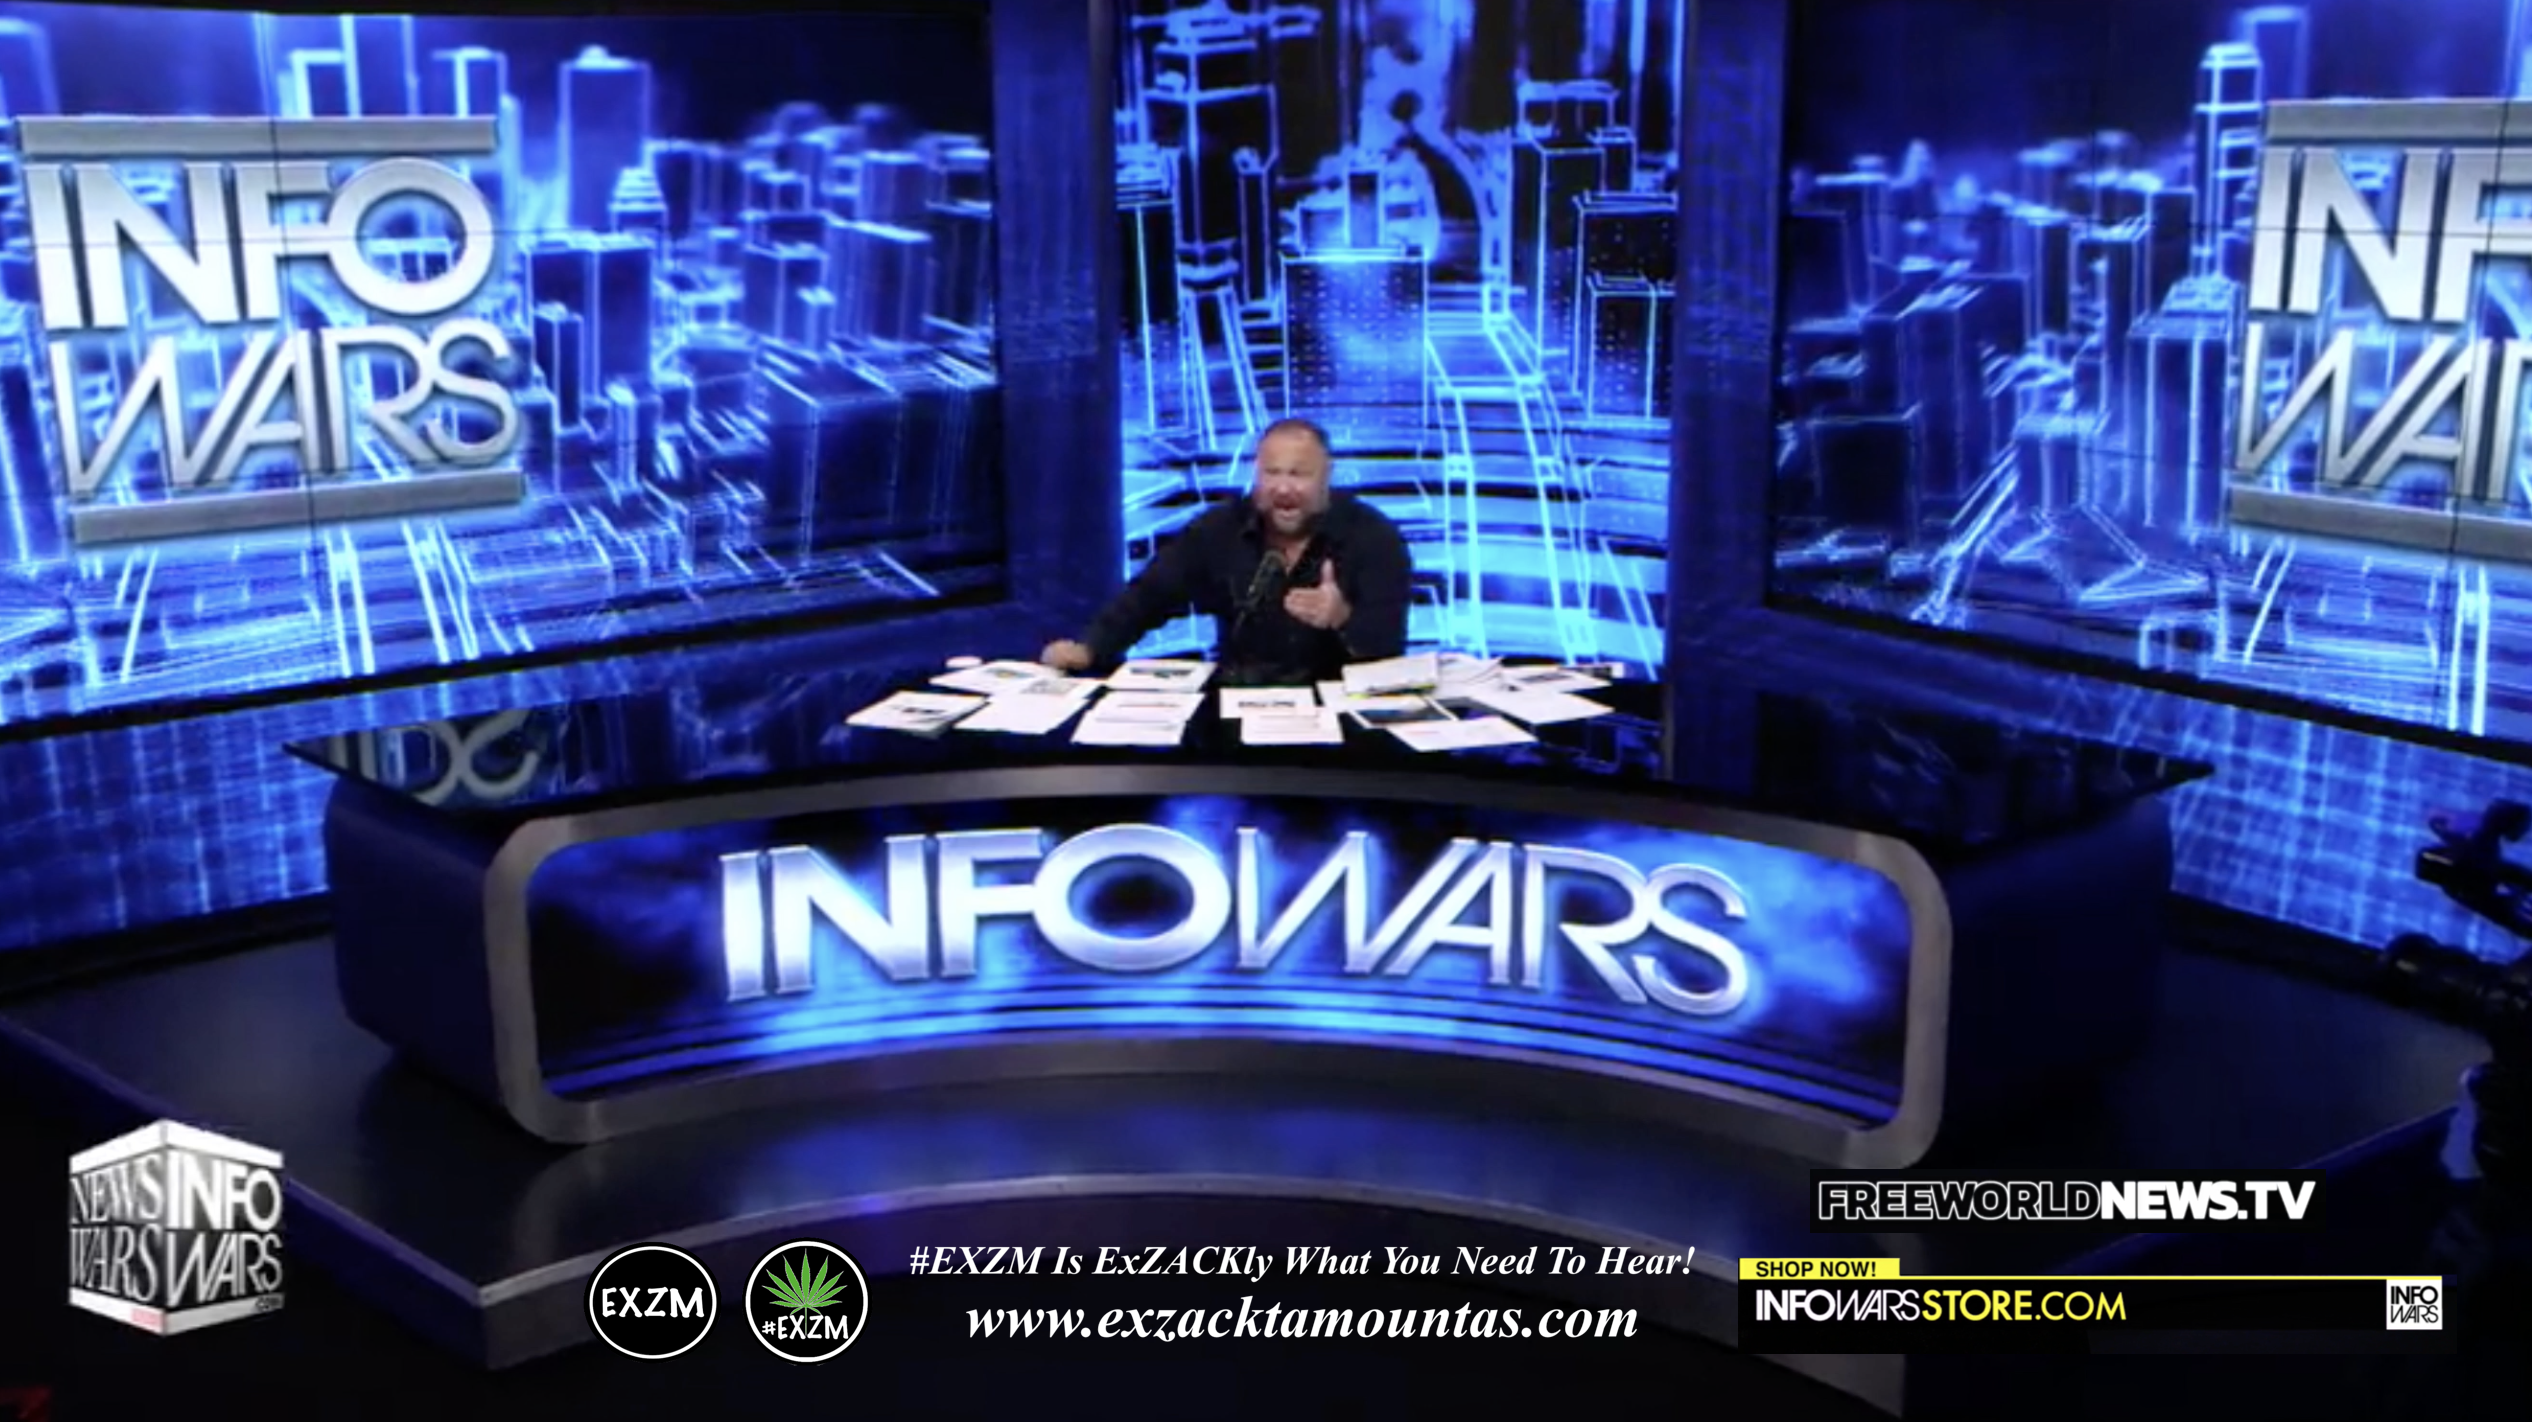 Alex Jones Live In Infowars Studio Free World News TV EXZM Zack Mount July 23rd 2021 copy